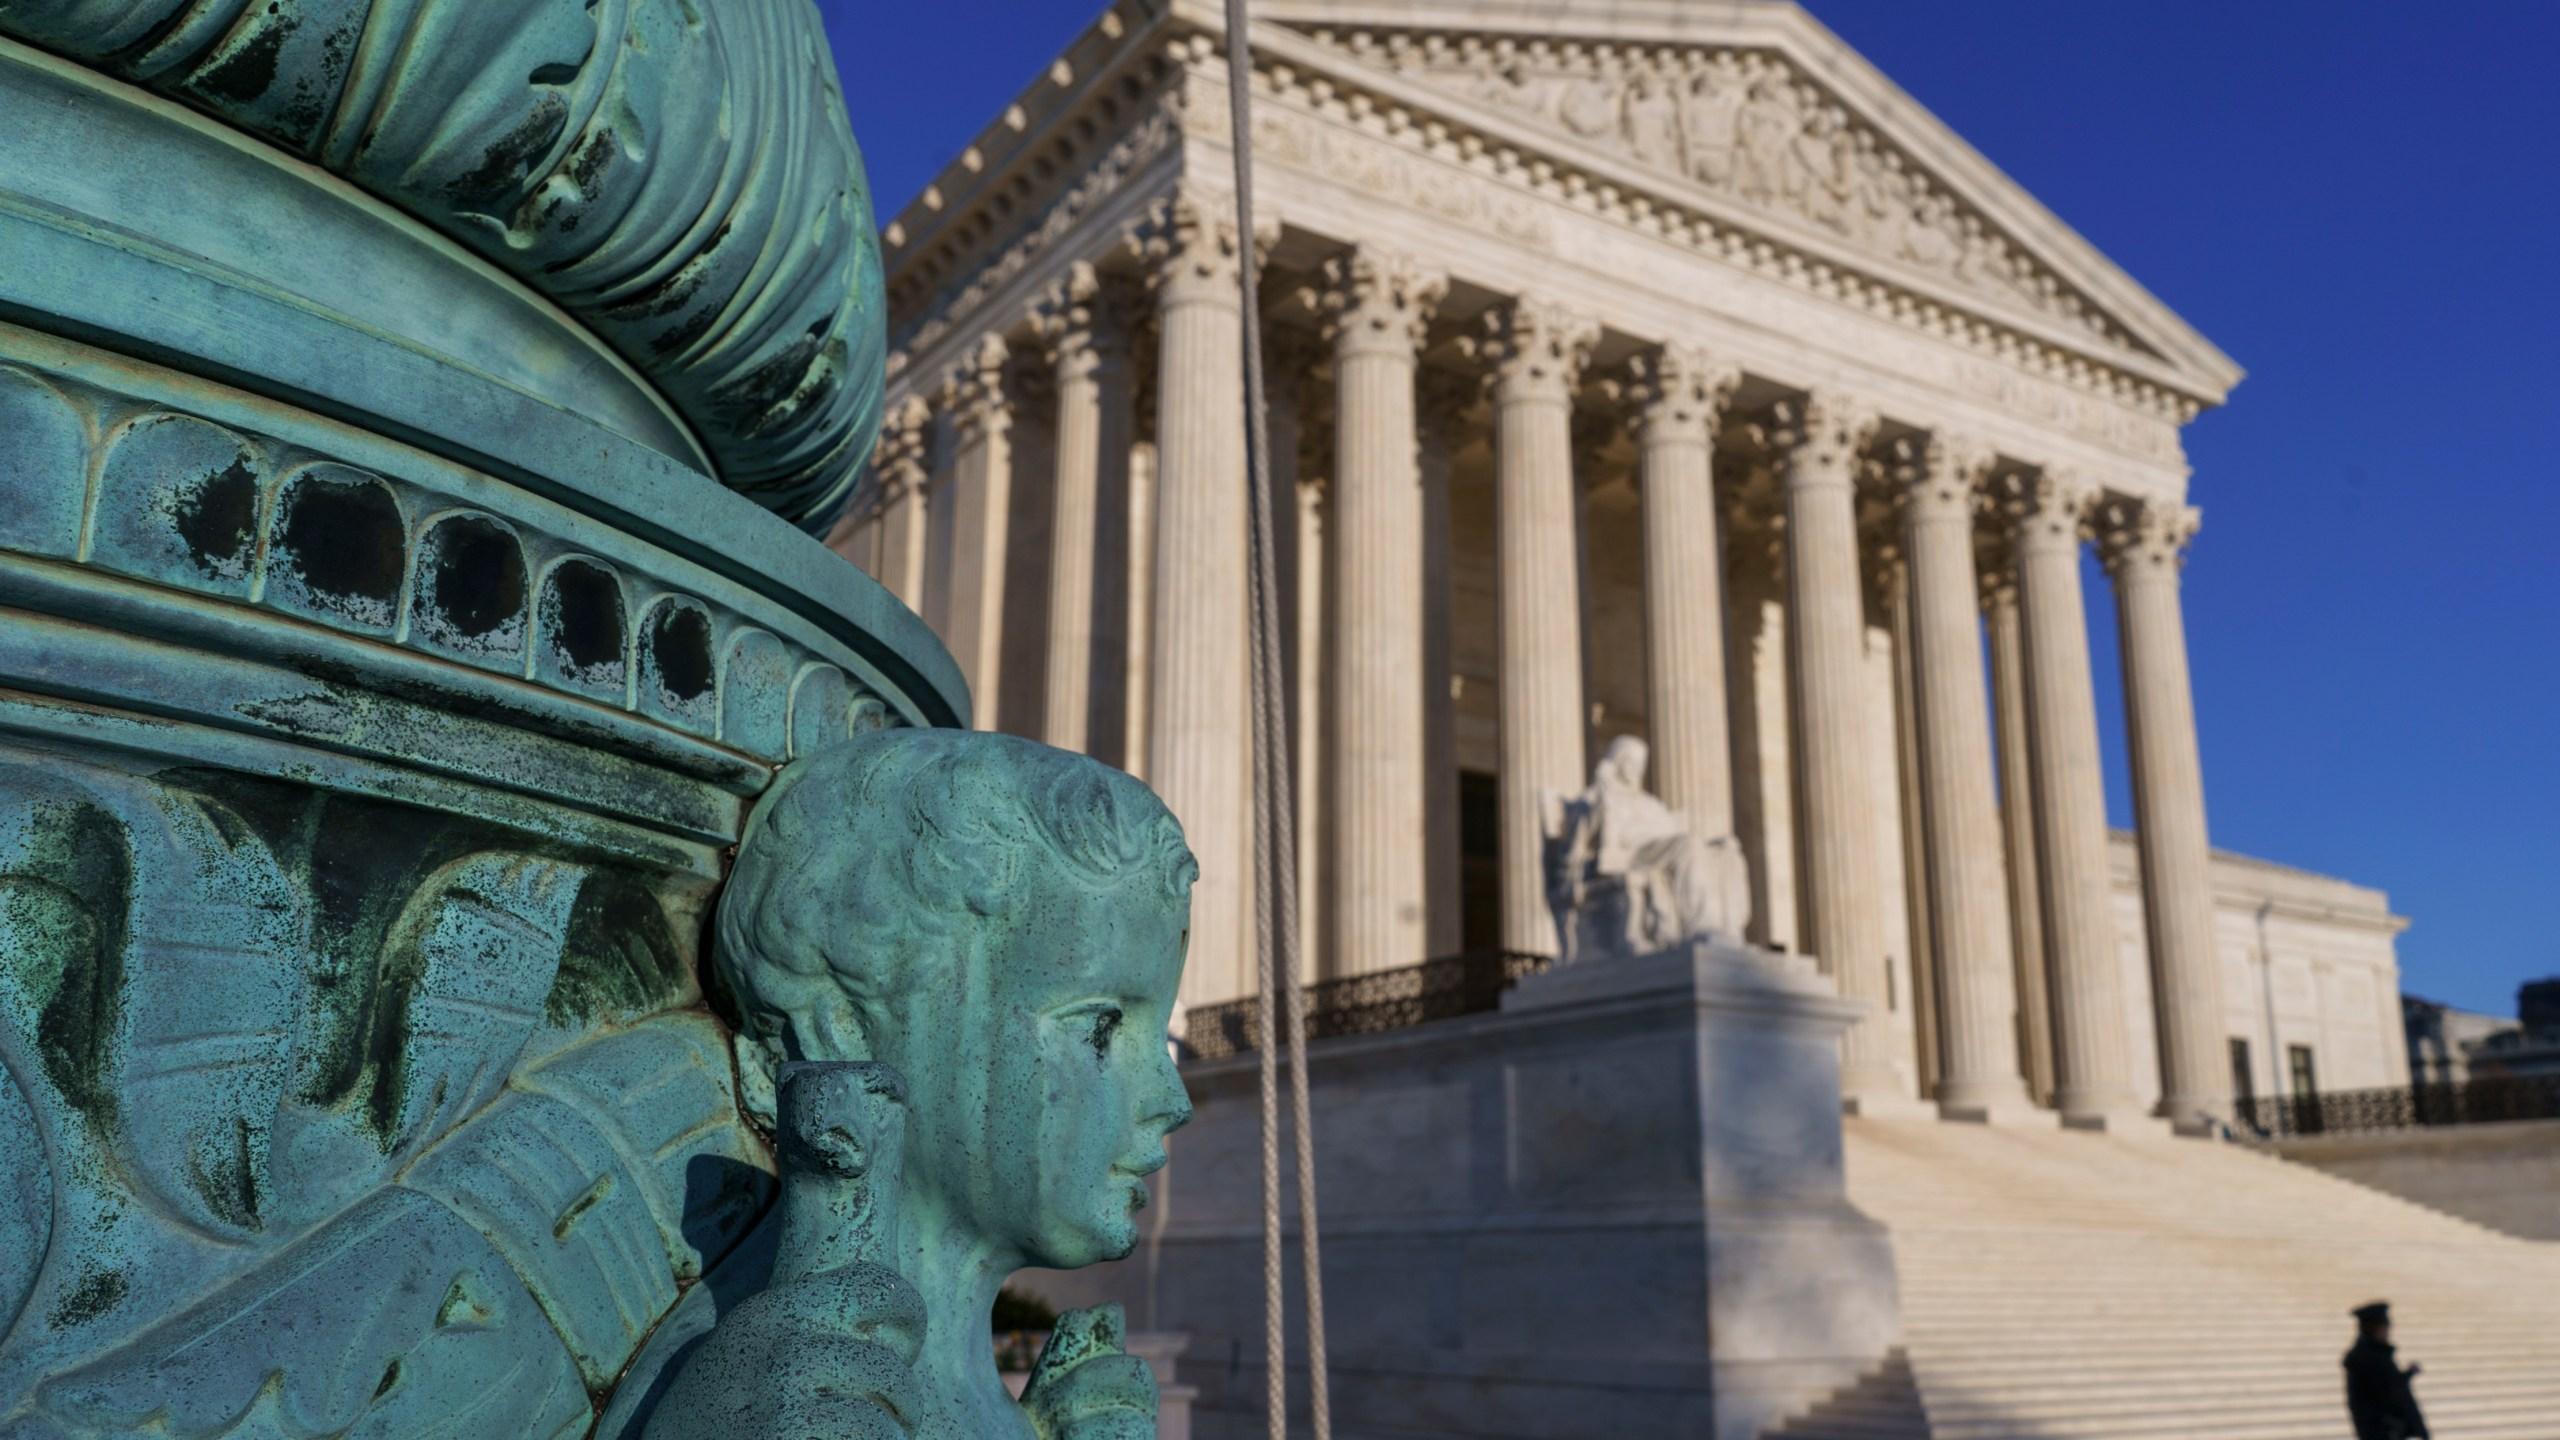 Supreme_Court_Arbitration_18336-159532.jpg02577896